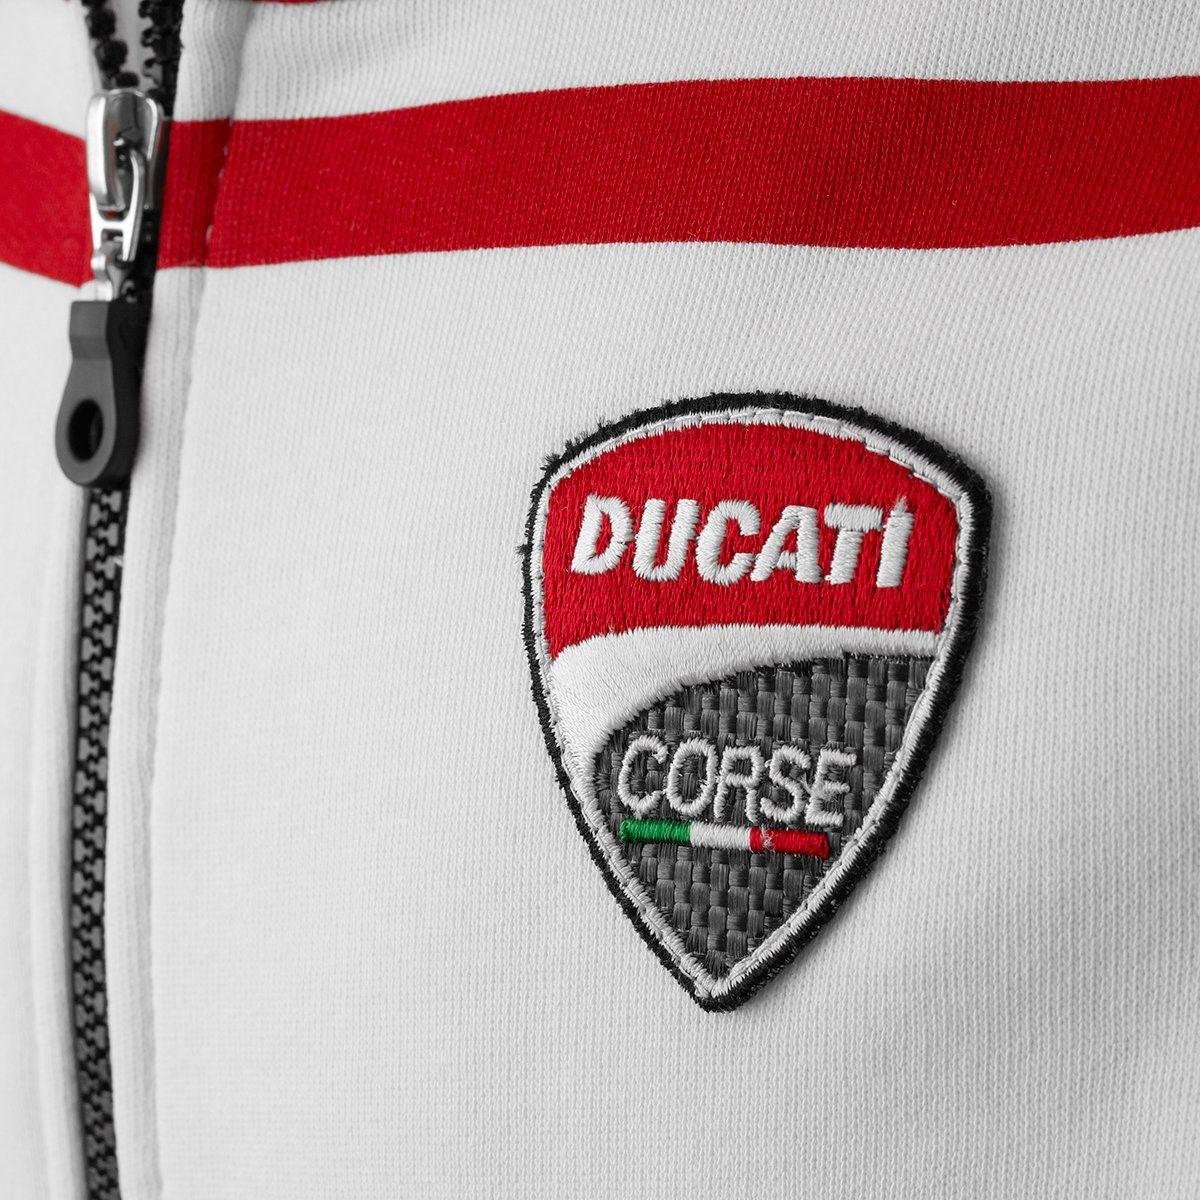 【DUCATI performance】Ducati Corse 連帽運動衫 - 「Webike-摩托百貨」